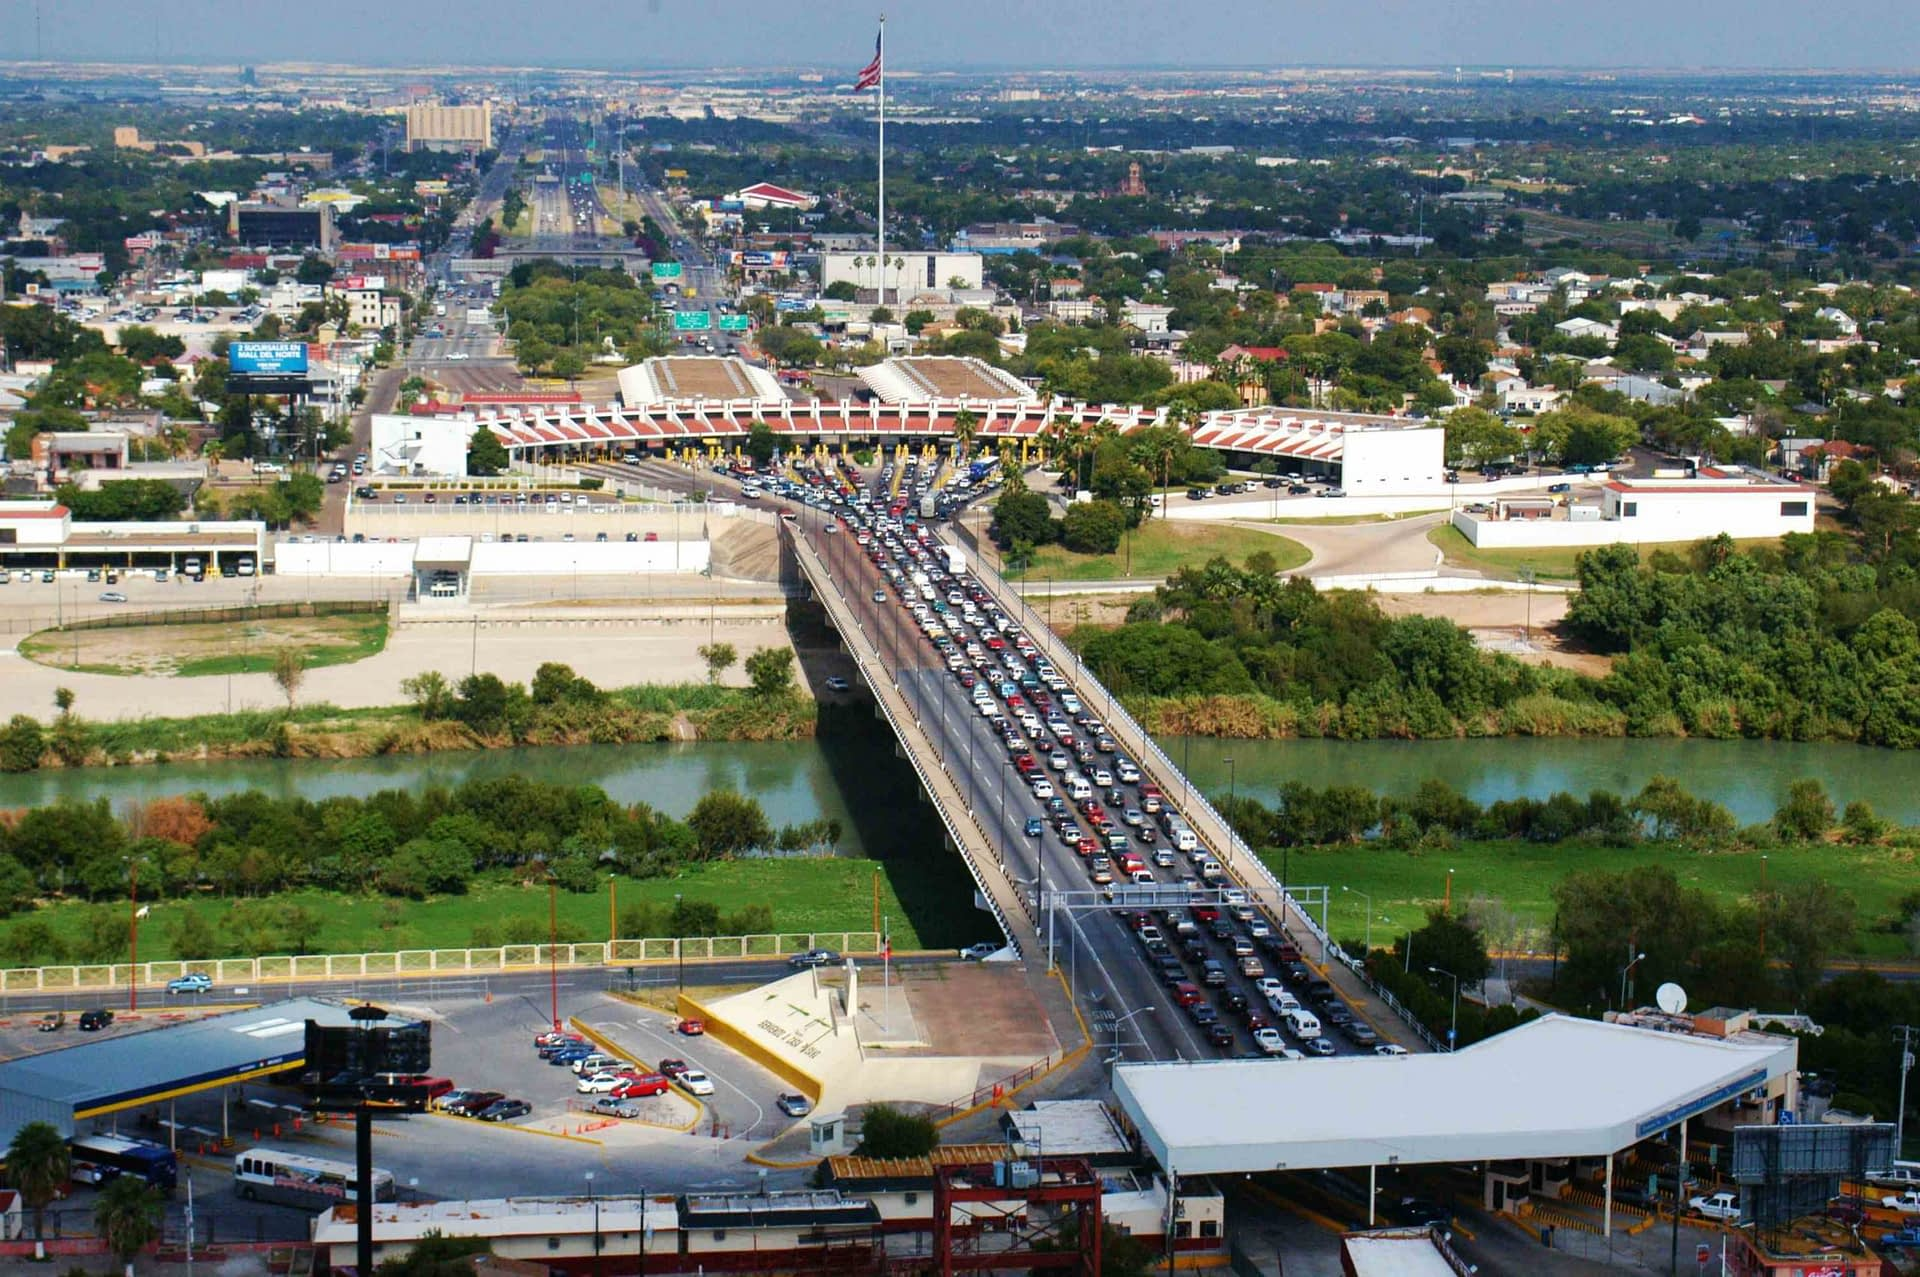 Laredo and Nuevo Laredo seek to minimize the impact of the pandemic